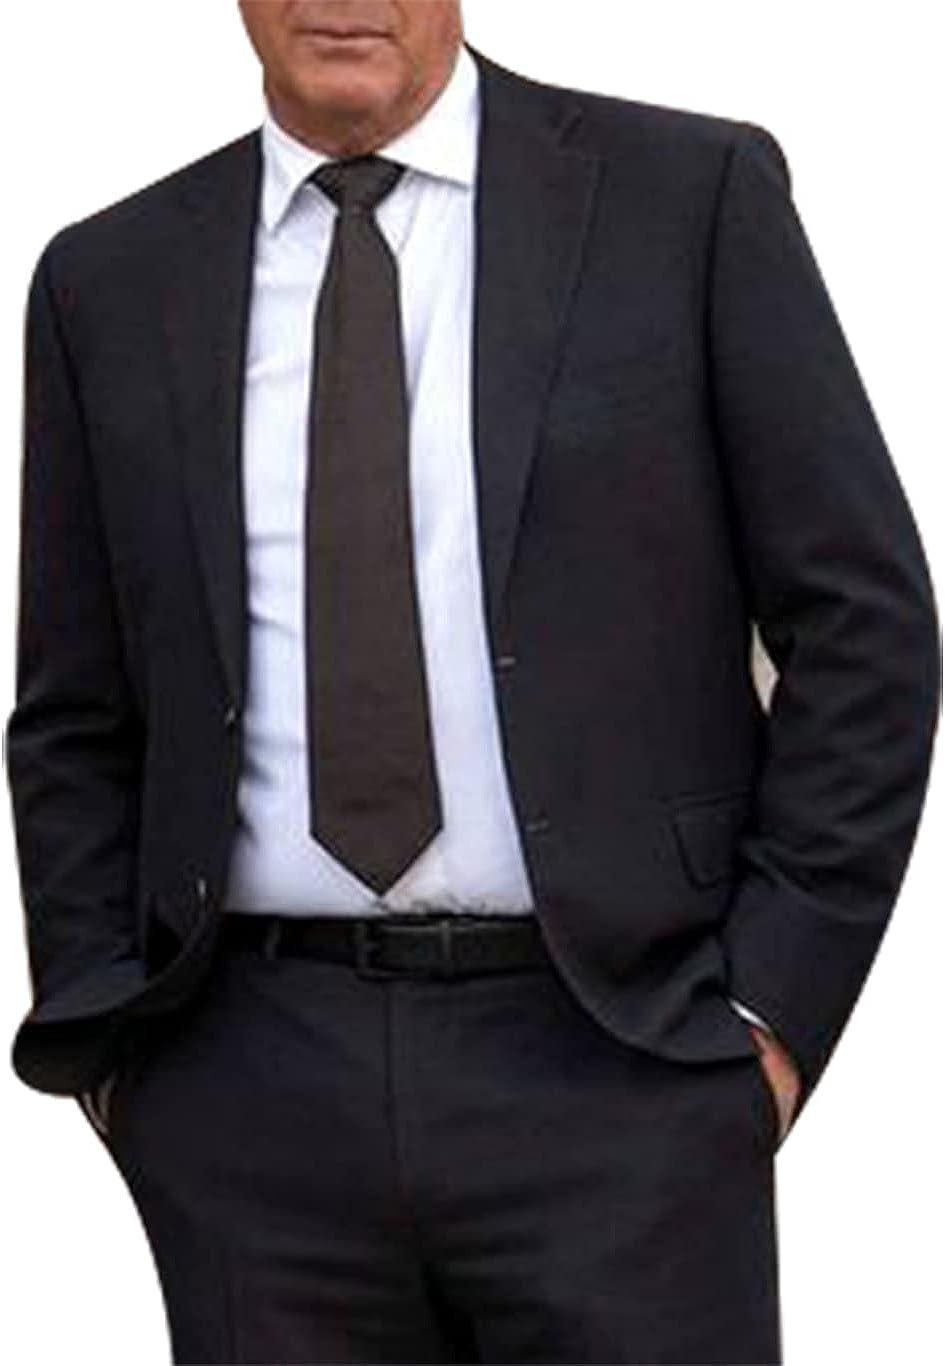 UGFashions Cowboy John Dutton Stone 2 Piece Westerner Businessman Ranch Formal Wedding Partry Tuxedo Black Suit